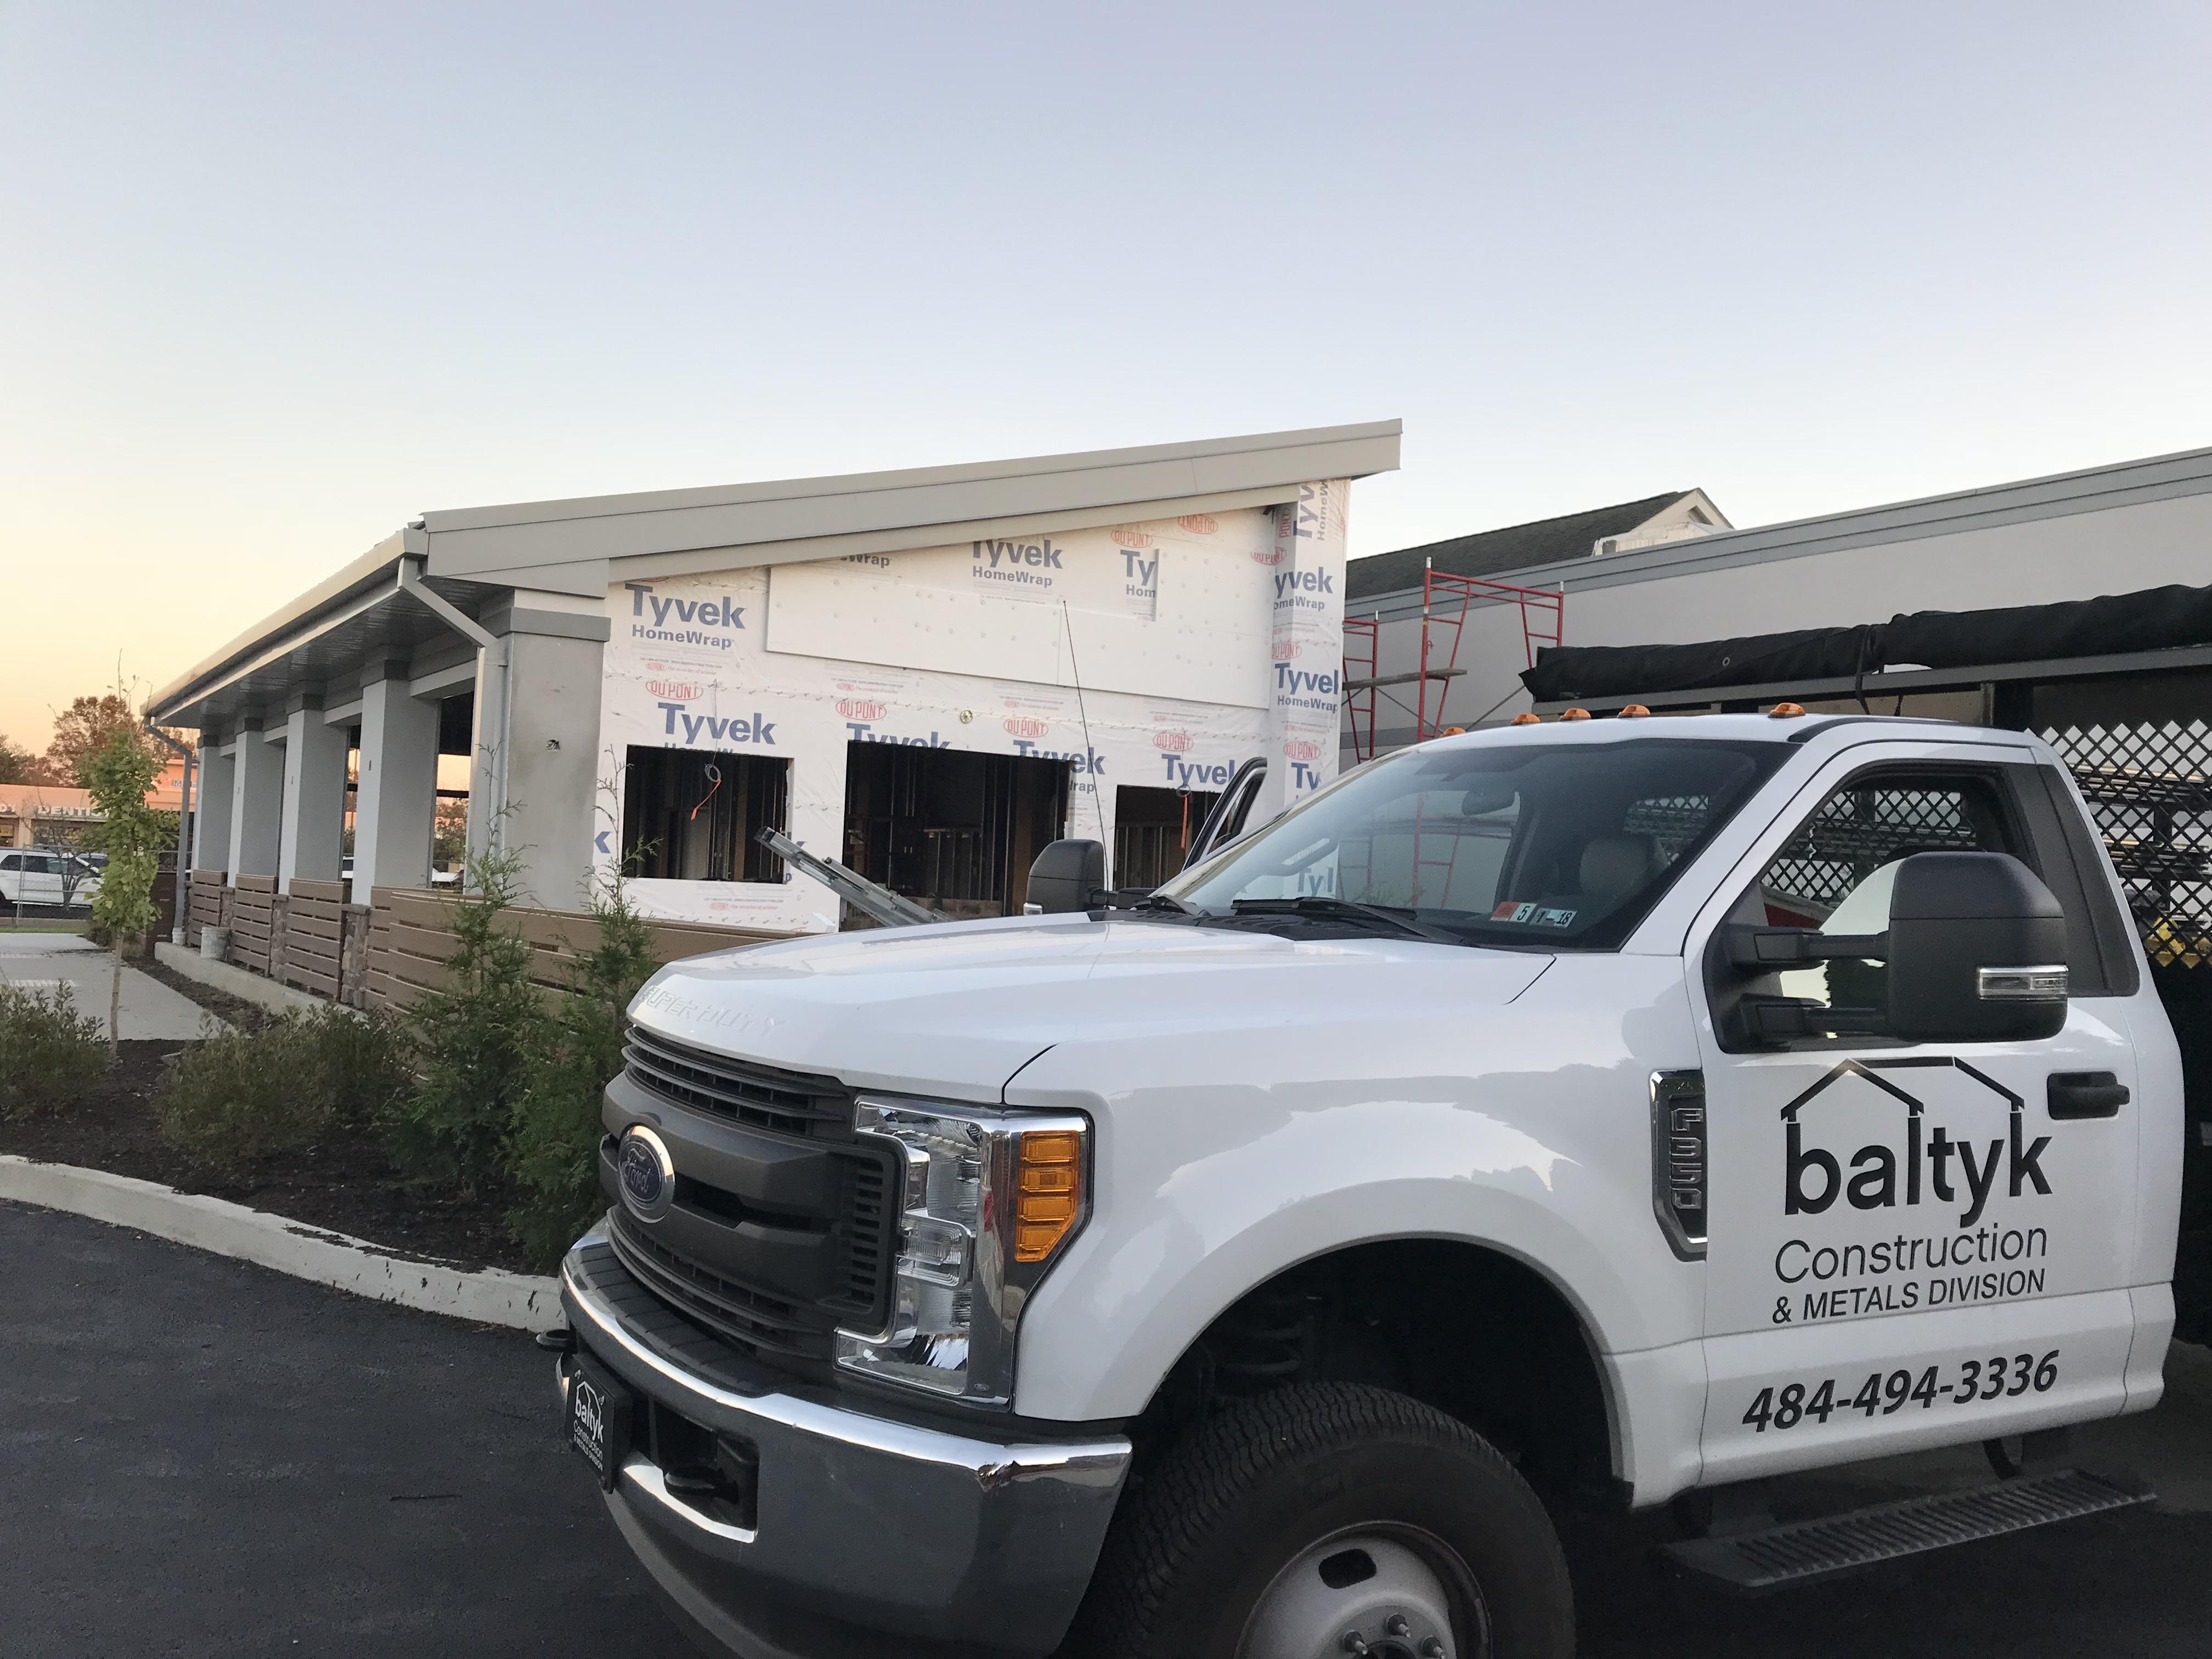 Baltyk Construction